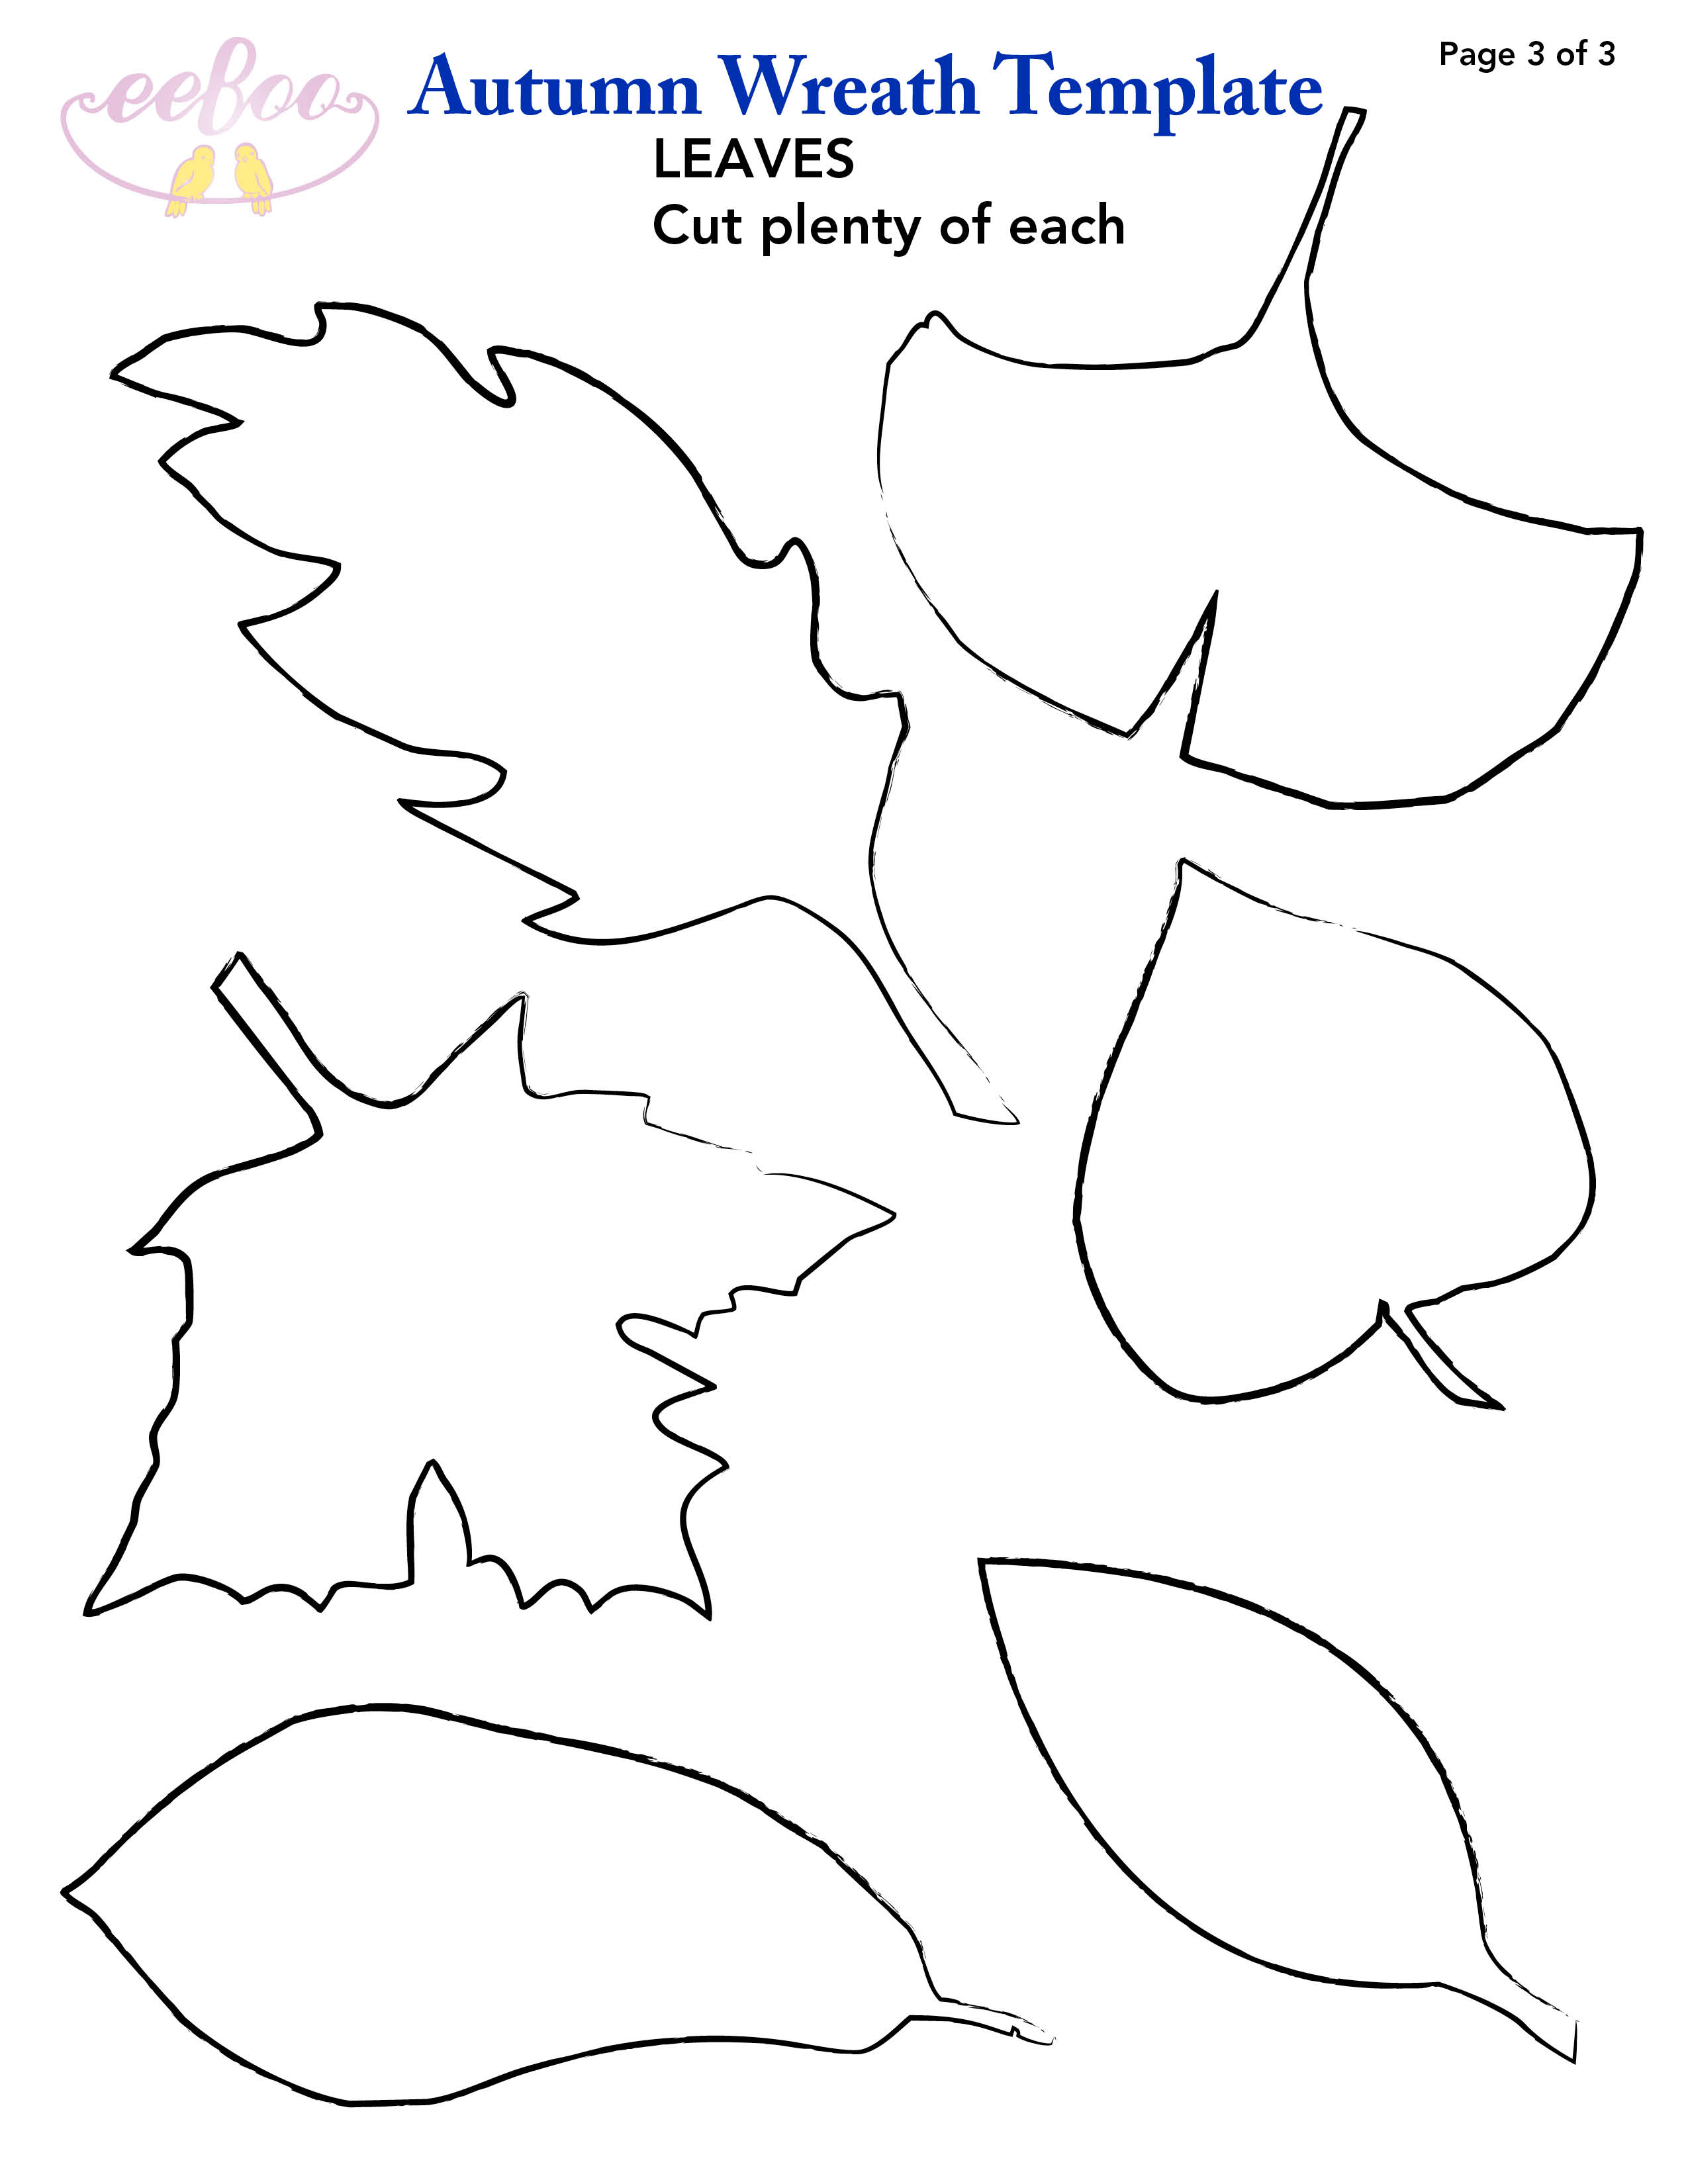 eeboo craft project-oct13-autumnwreath3